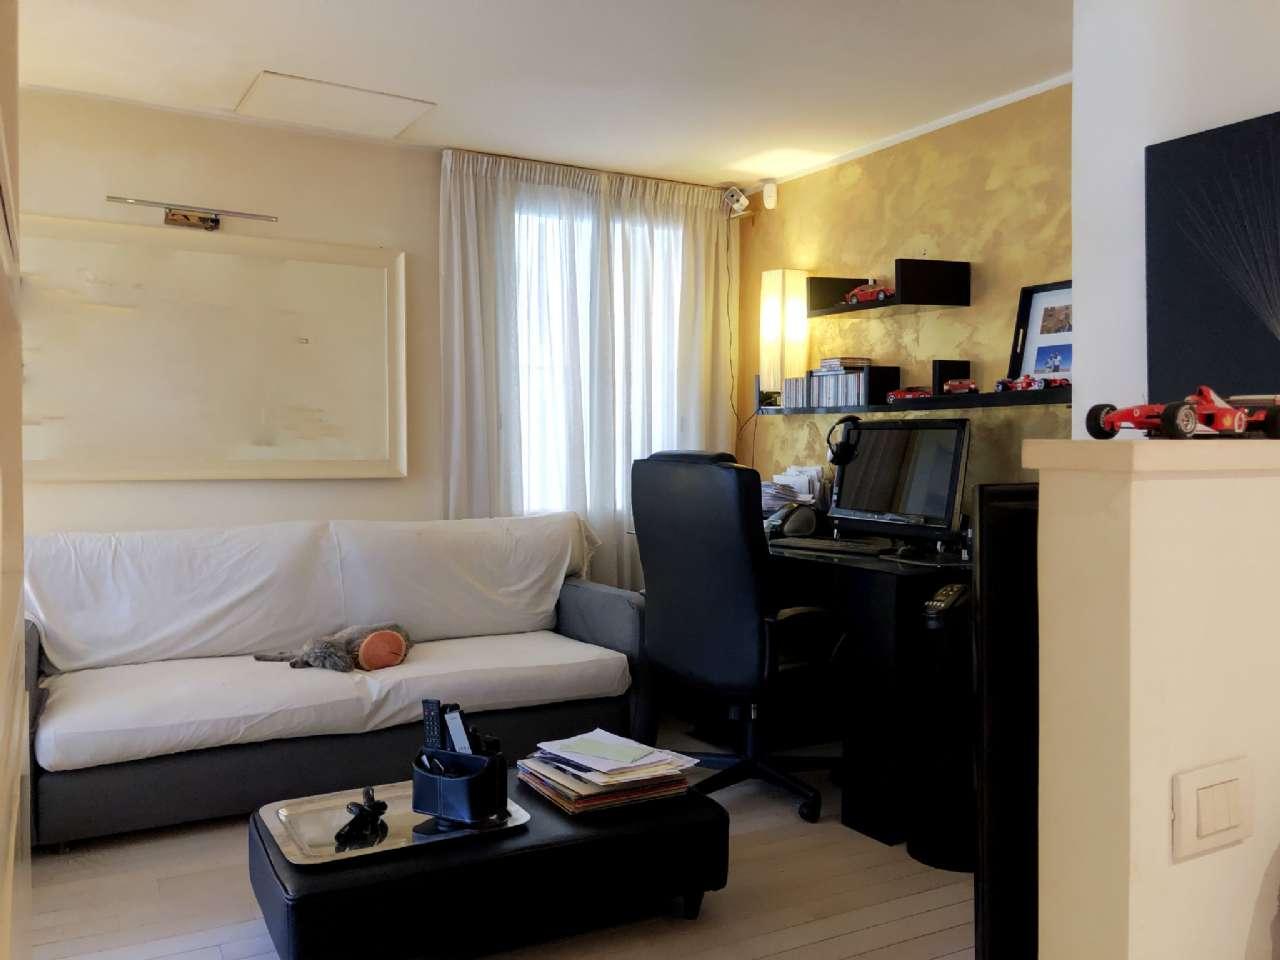 Appartamento, Via dei Monti Parioli, Roma, foto 1